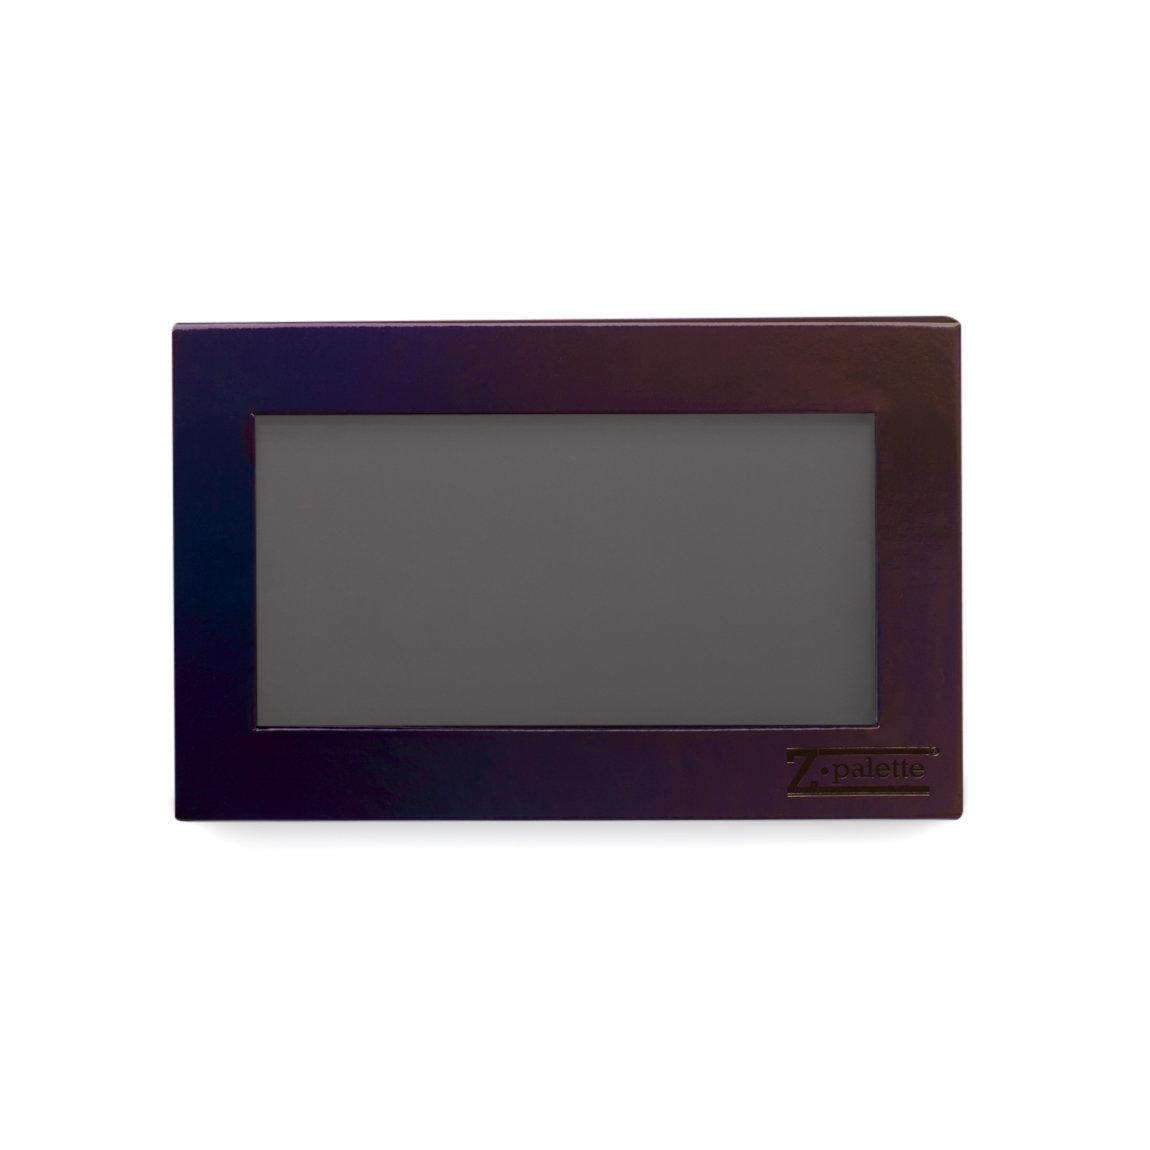 Z•Palette Phantom Palette Medium alternative view 1 - product swatch.